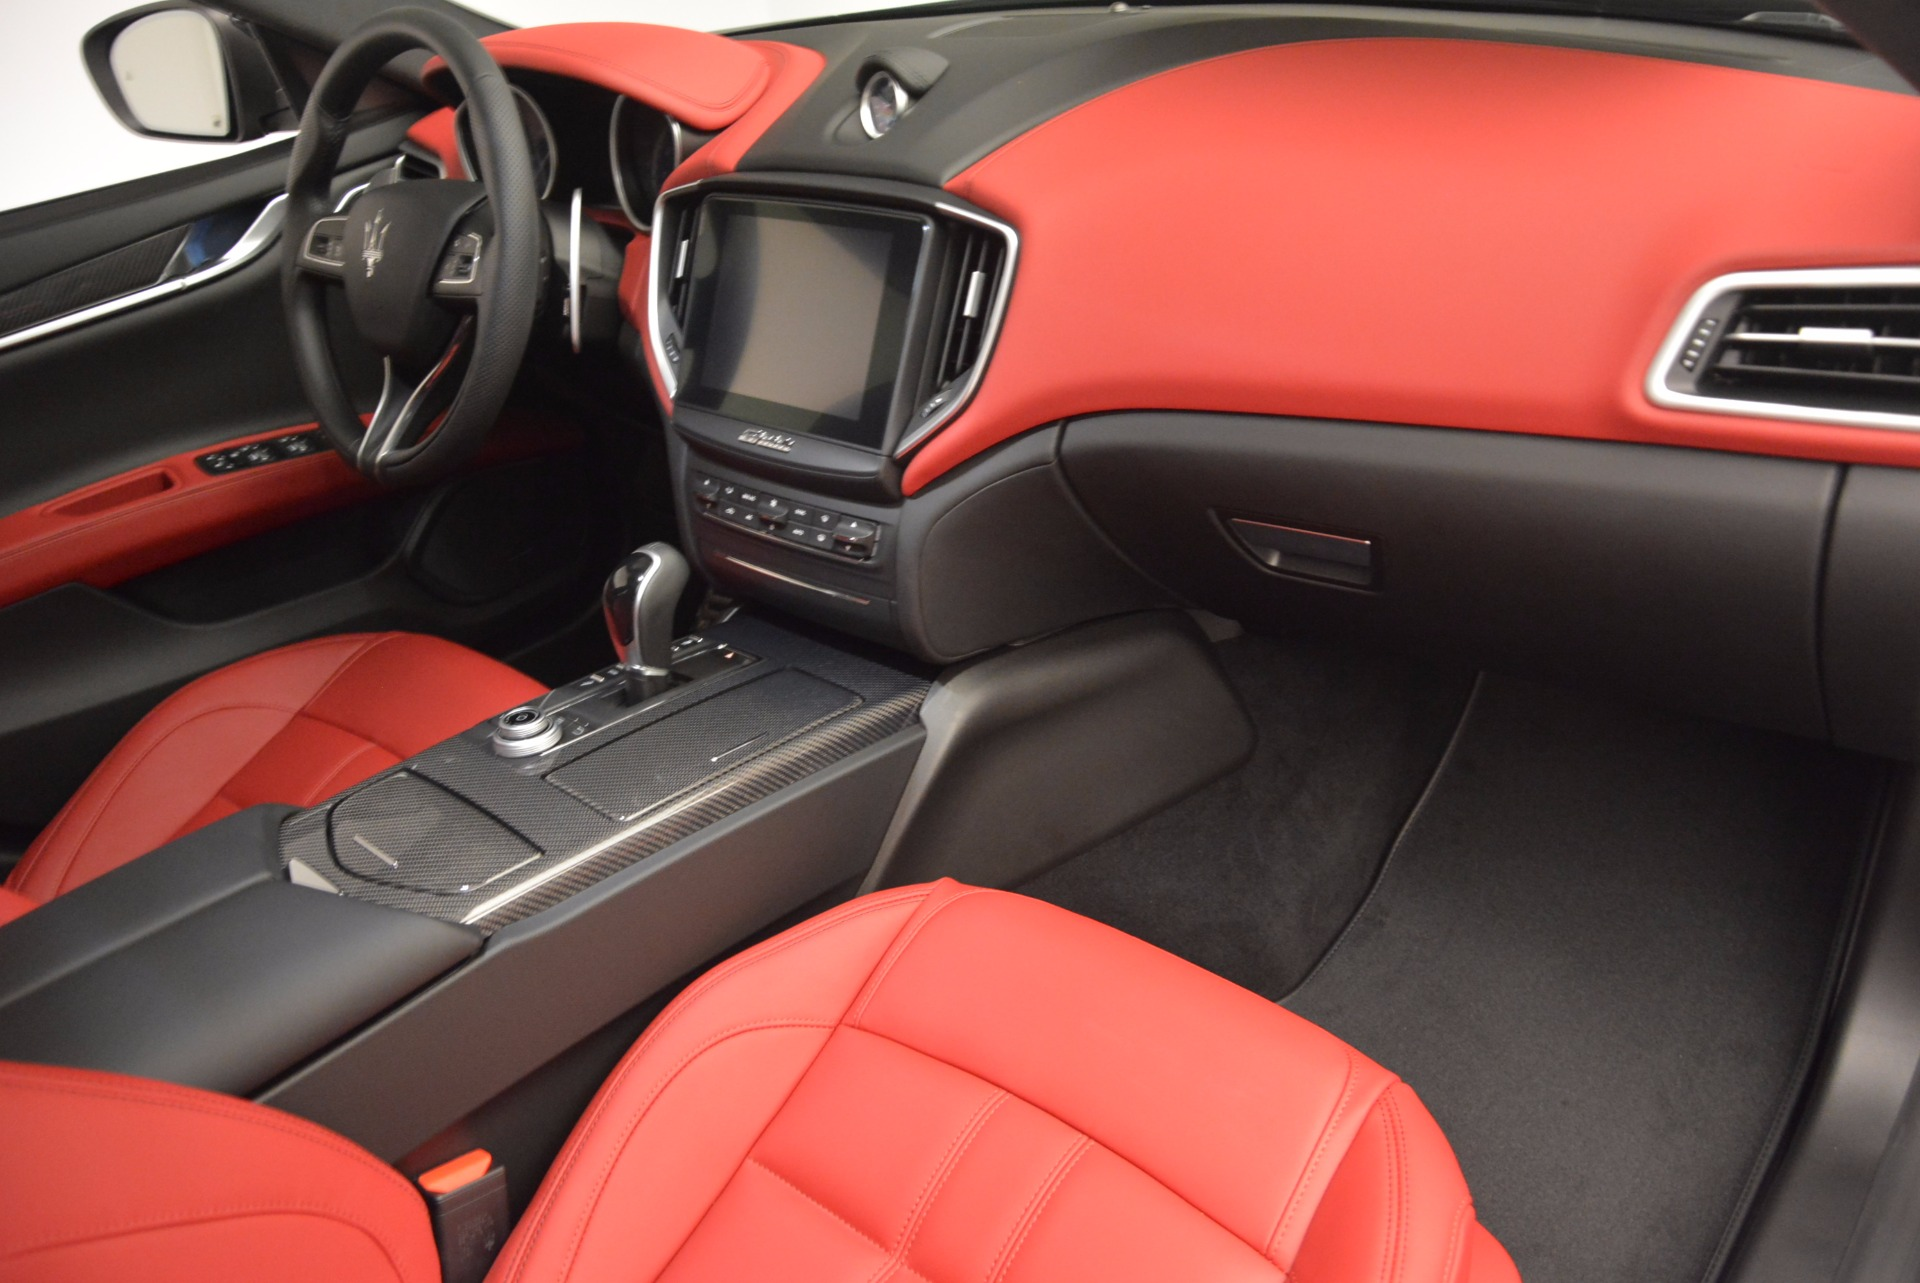 Used 2017 Maserati Ghibli S Q4 For Sale In Greenwich, CT. Alfa Romeo of Greenwich, M1862 1121_p15